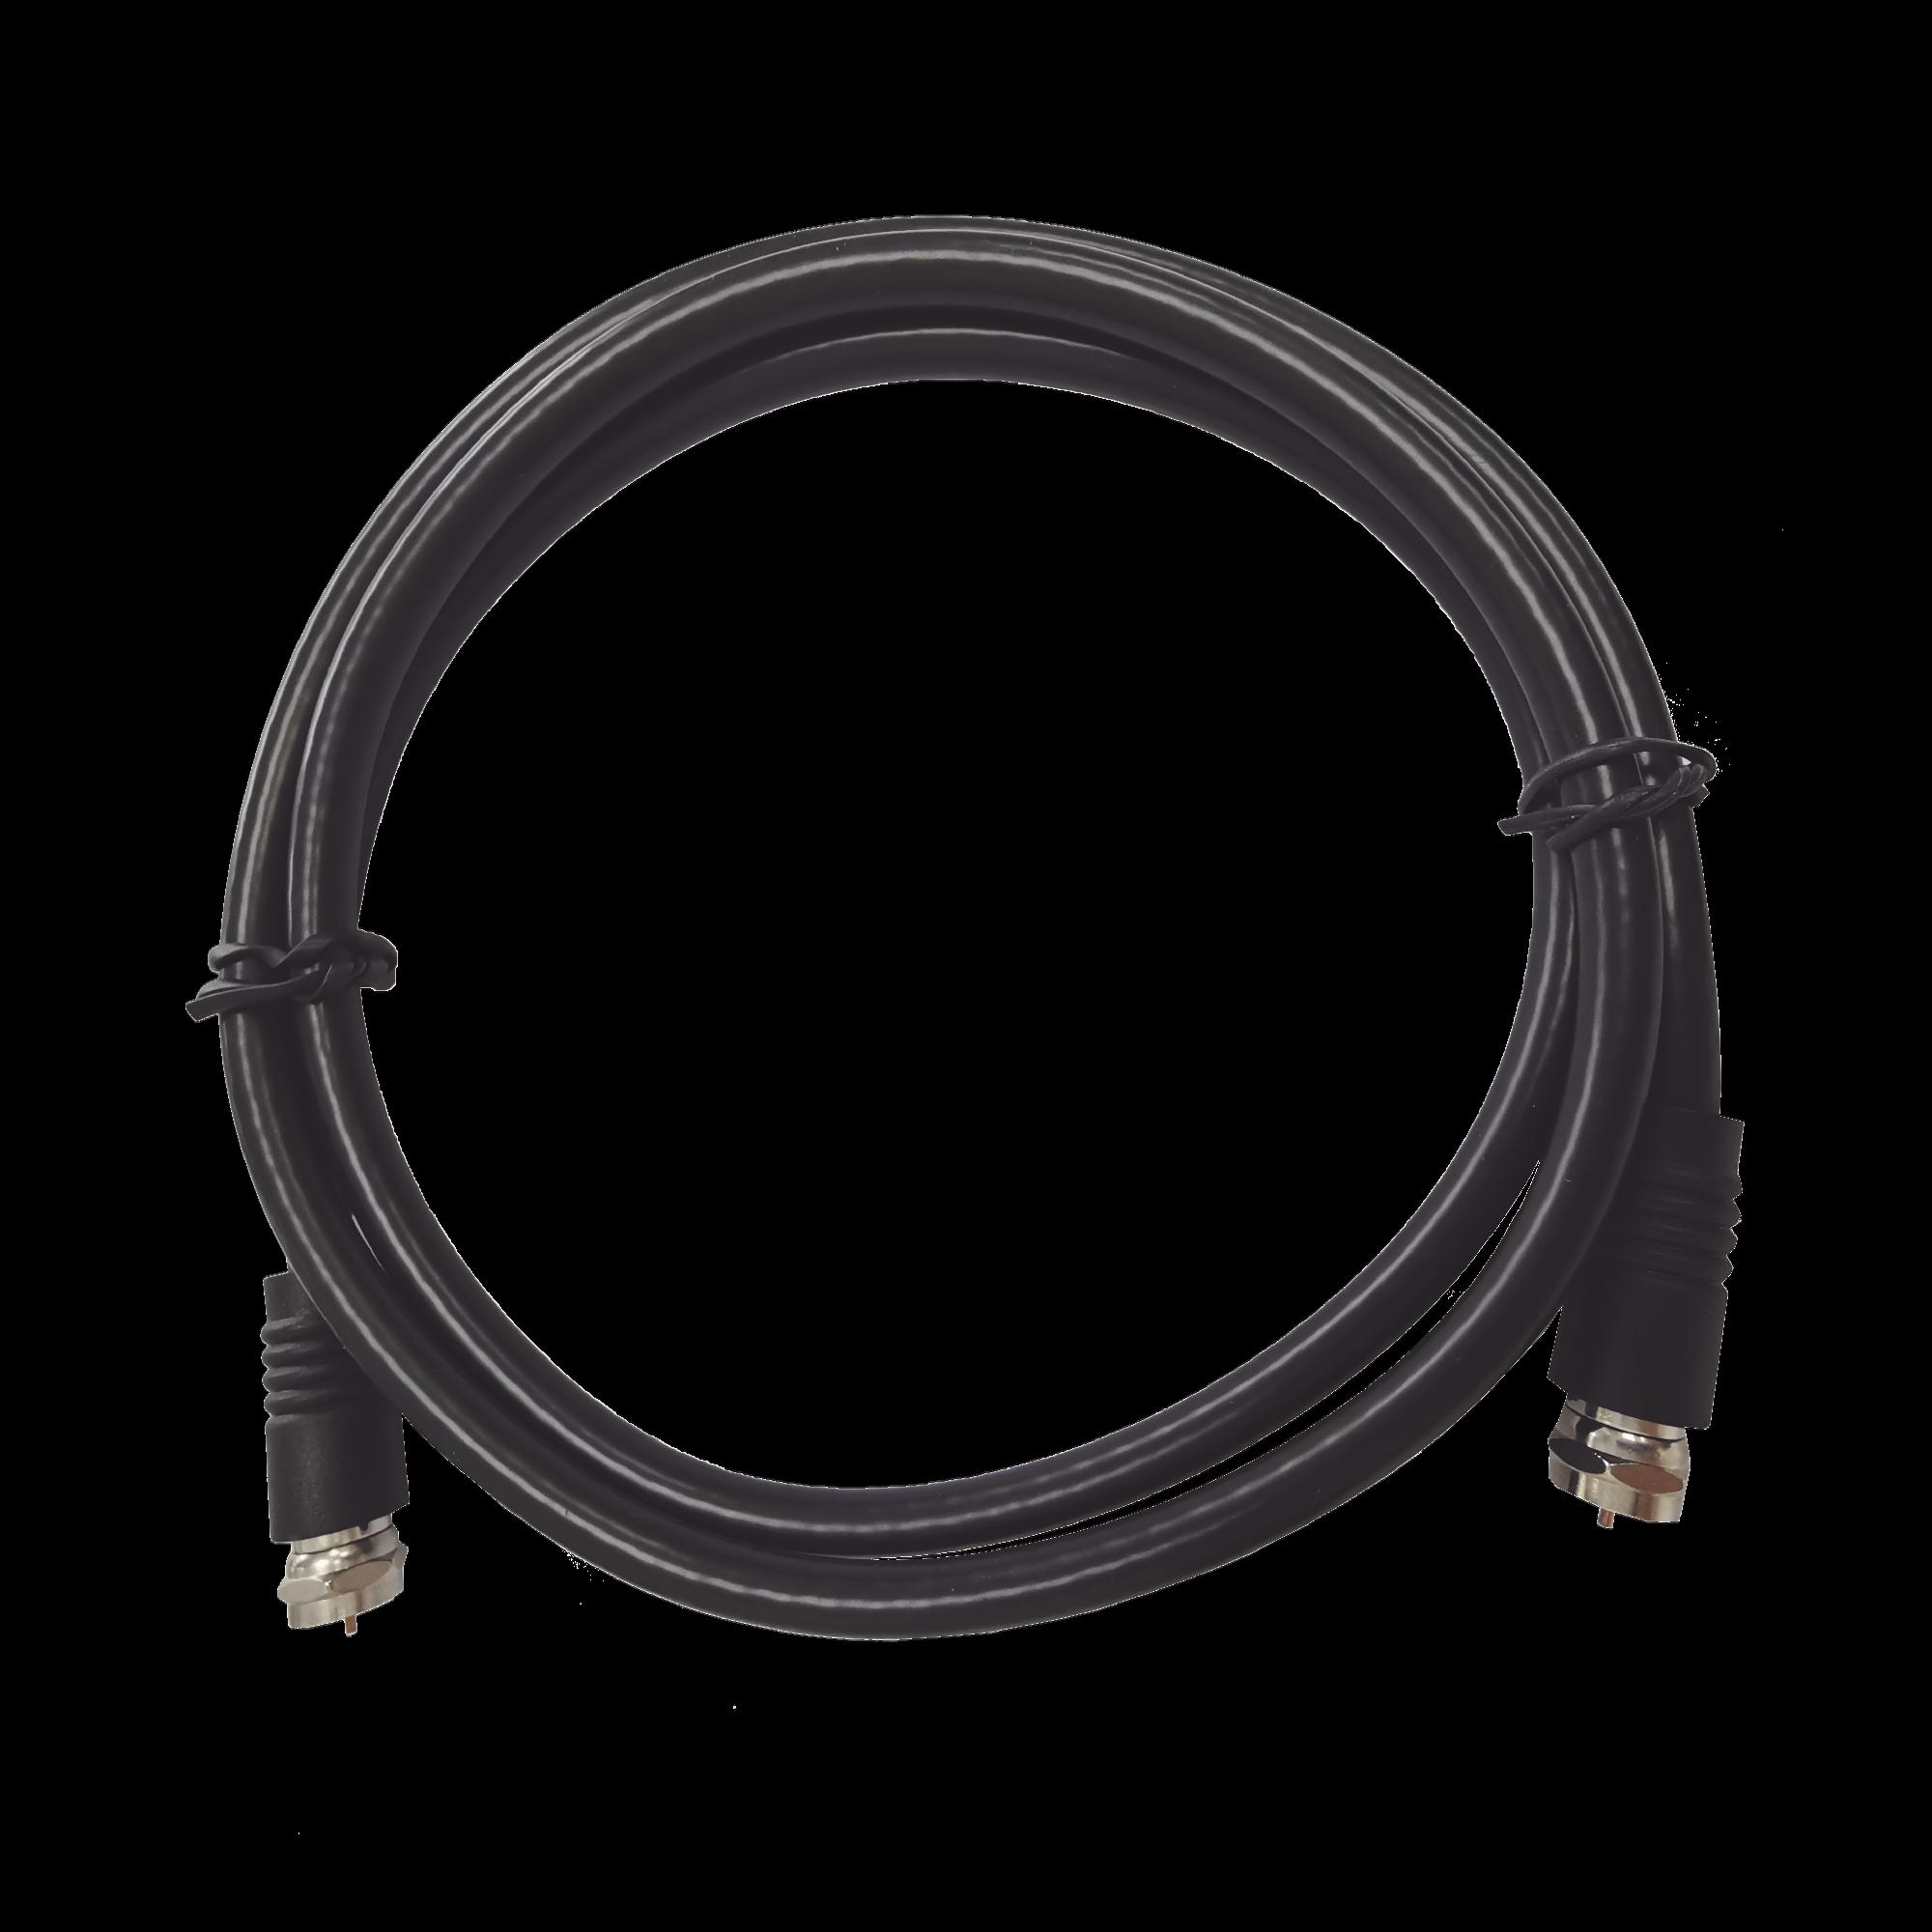 Conector Cable Coaxial / F Macho a F Macho / 30 Centimetros / Cable RG6